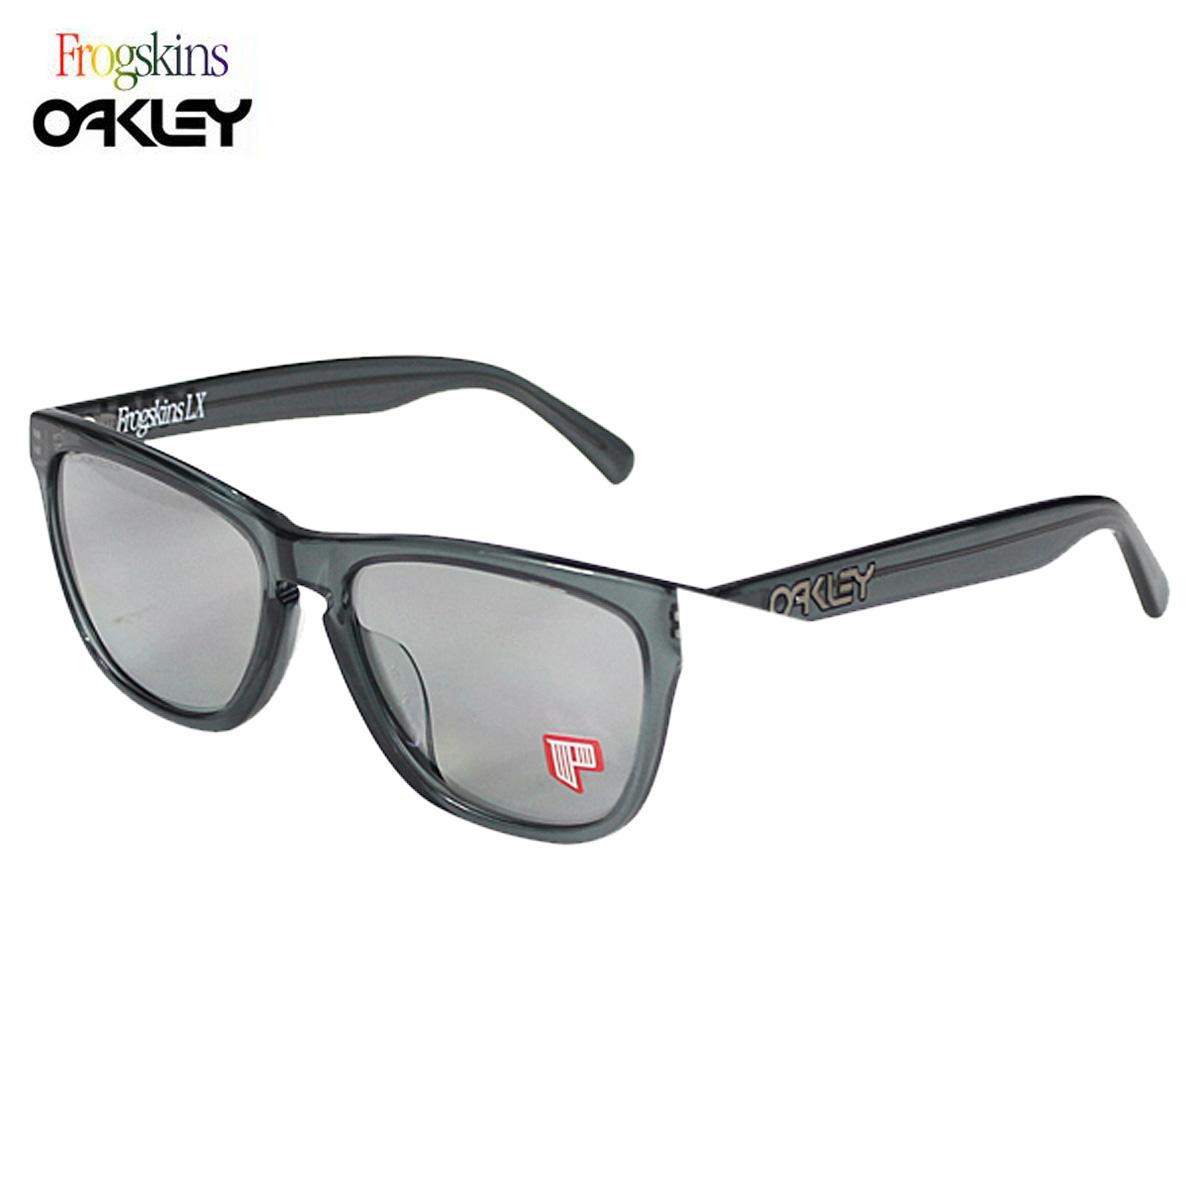 bad65632dc Oakley Oakley Sunglasses Polarized Frogskins LX polarized frog skin mens  Womens polarized lens glasses Asian fit OO2039-04 unisex  regular